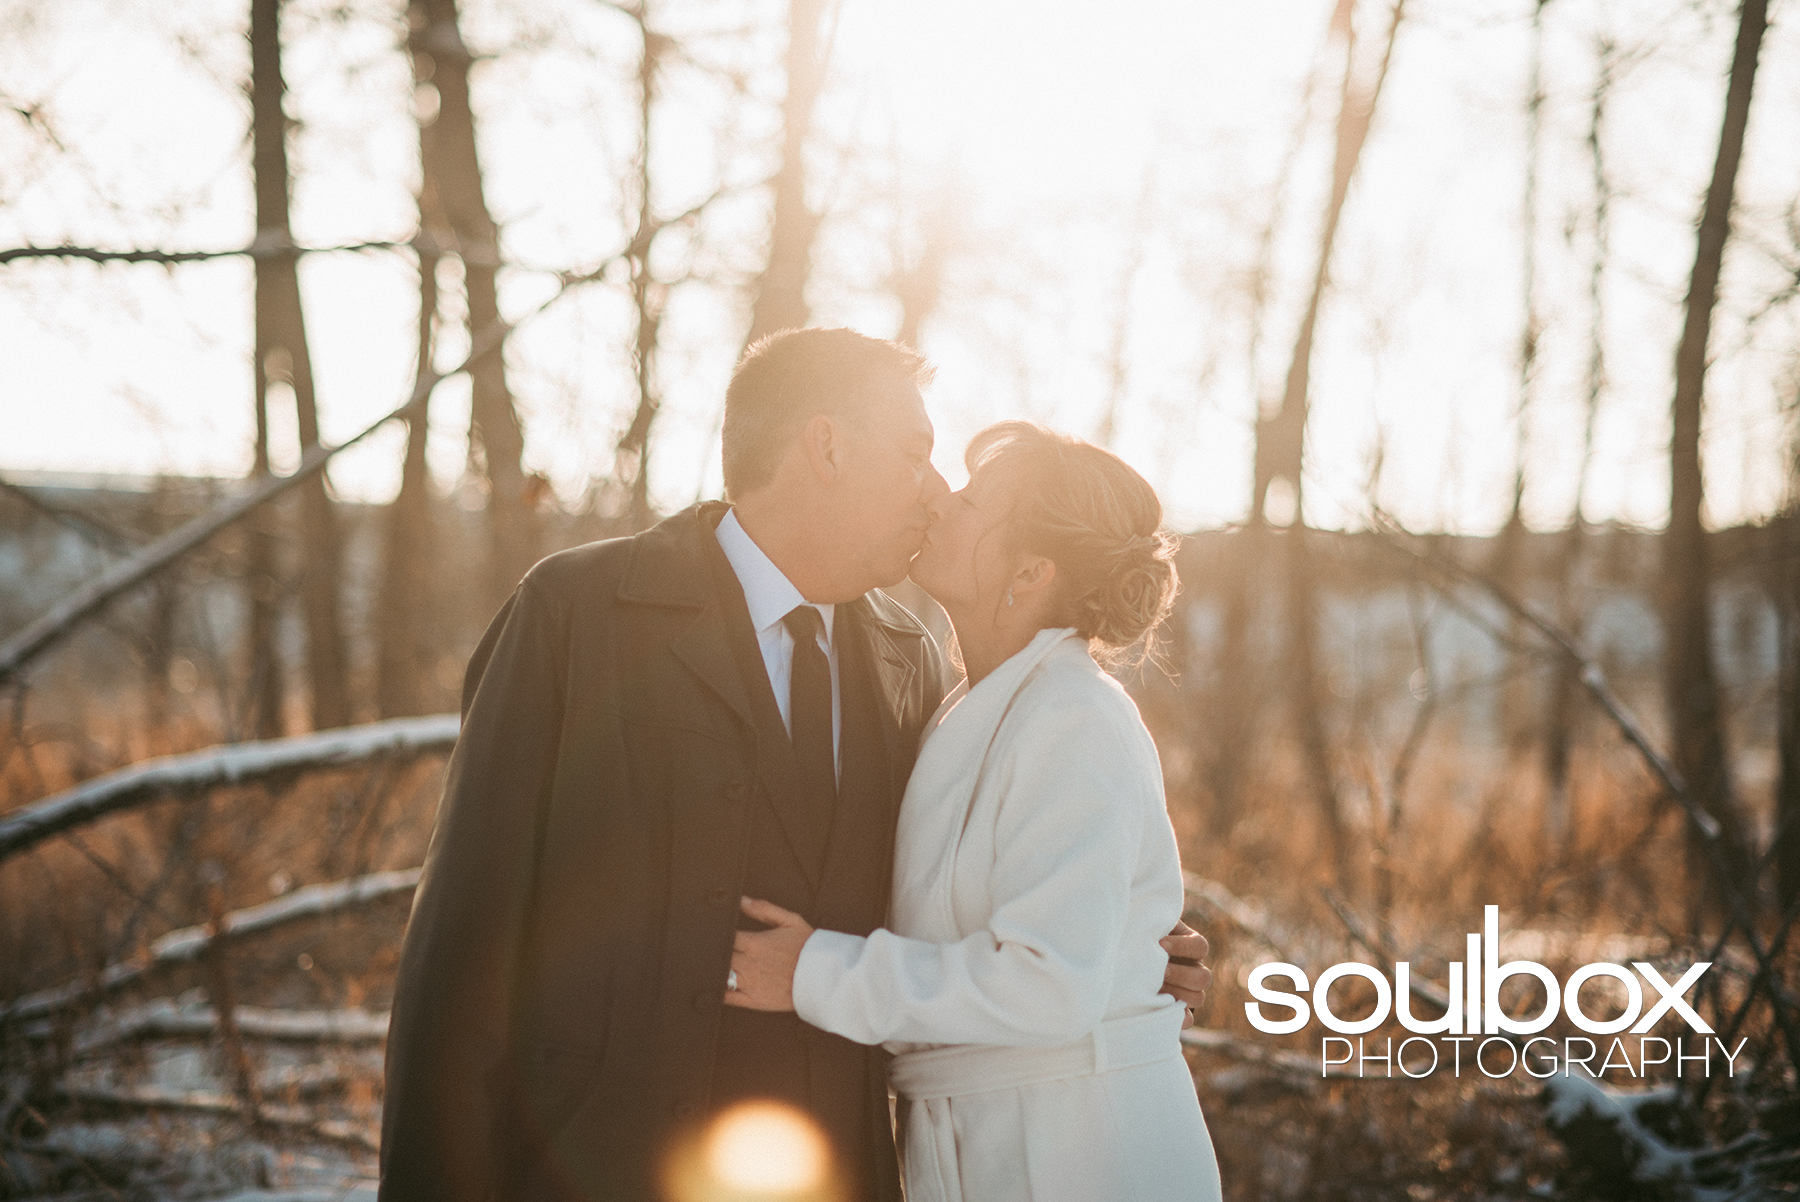 SoulboxPhotography-WinterWedding-6.jpg